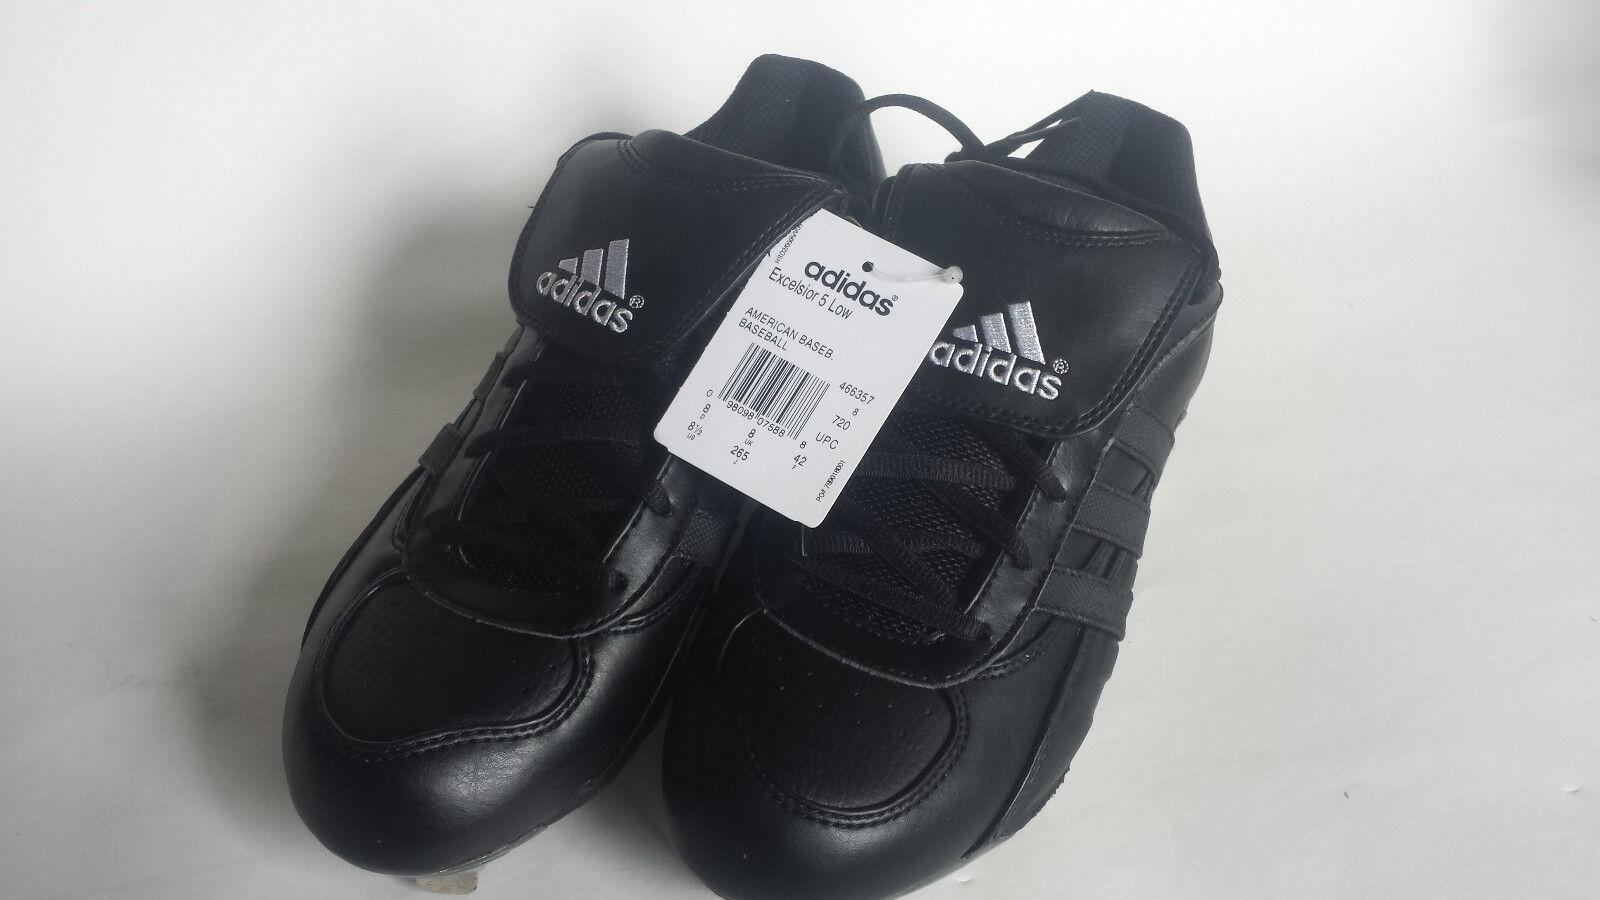 Brand New Mens Baseball Black/Black/Sil Adidas Excelsior 5 Low Metal Baseball Mens Cleats 8.5 9e1a40